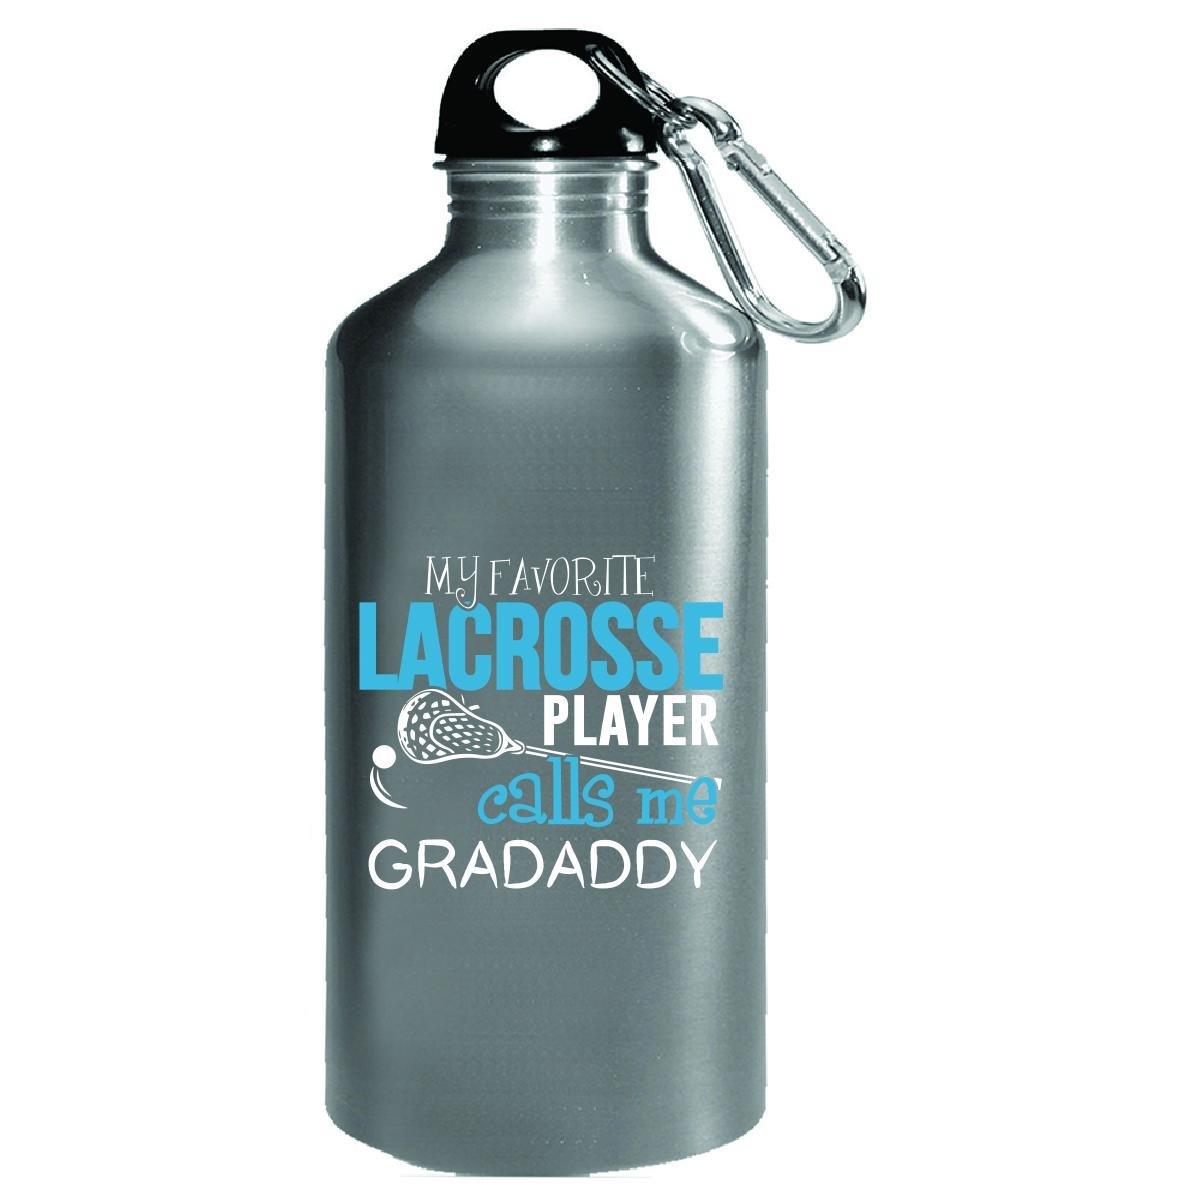 My Favorite Lacrosse Player Calls Me Grandpa Gradaddy - Water Bottle